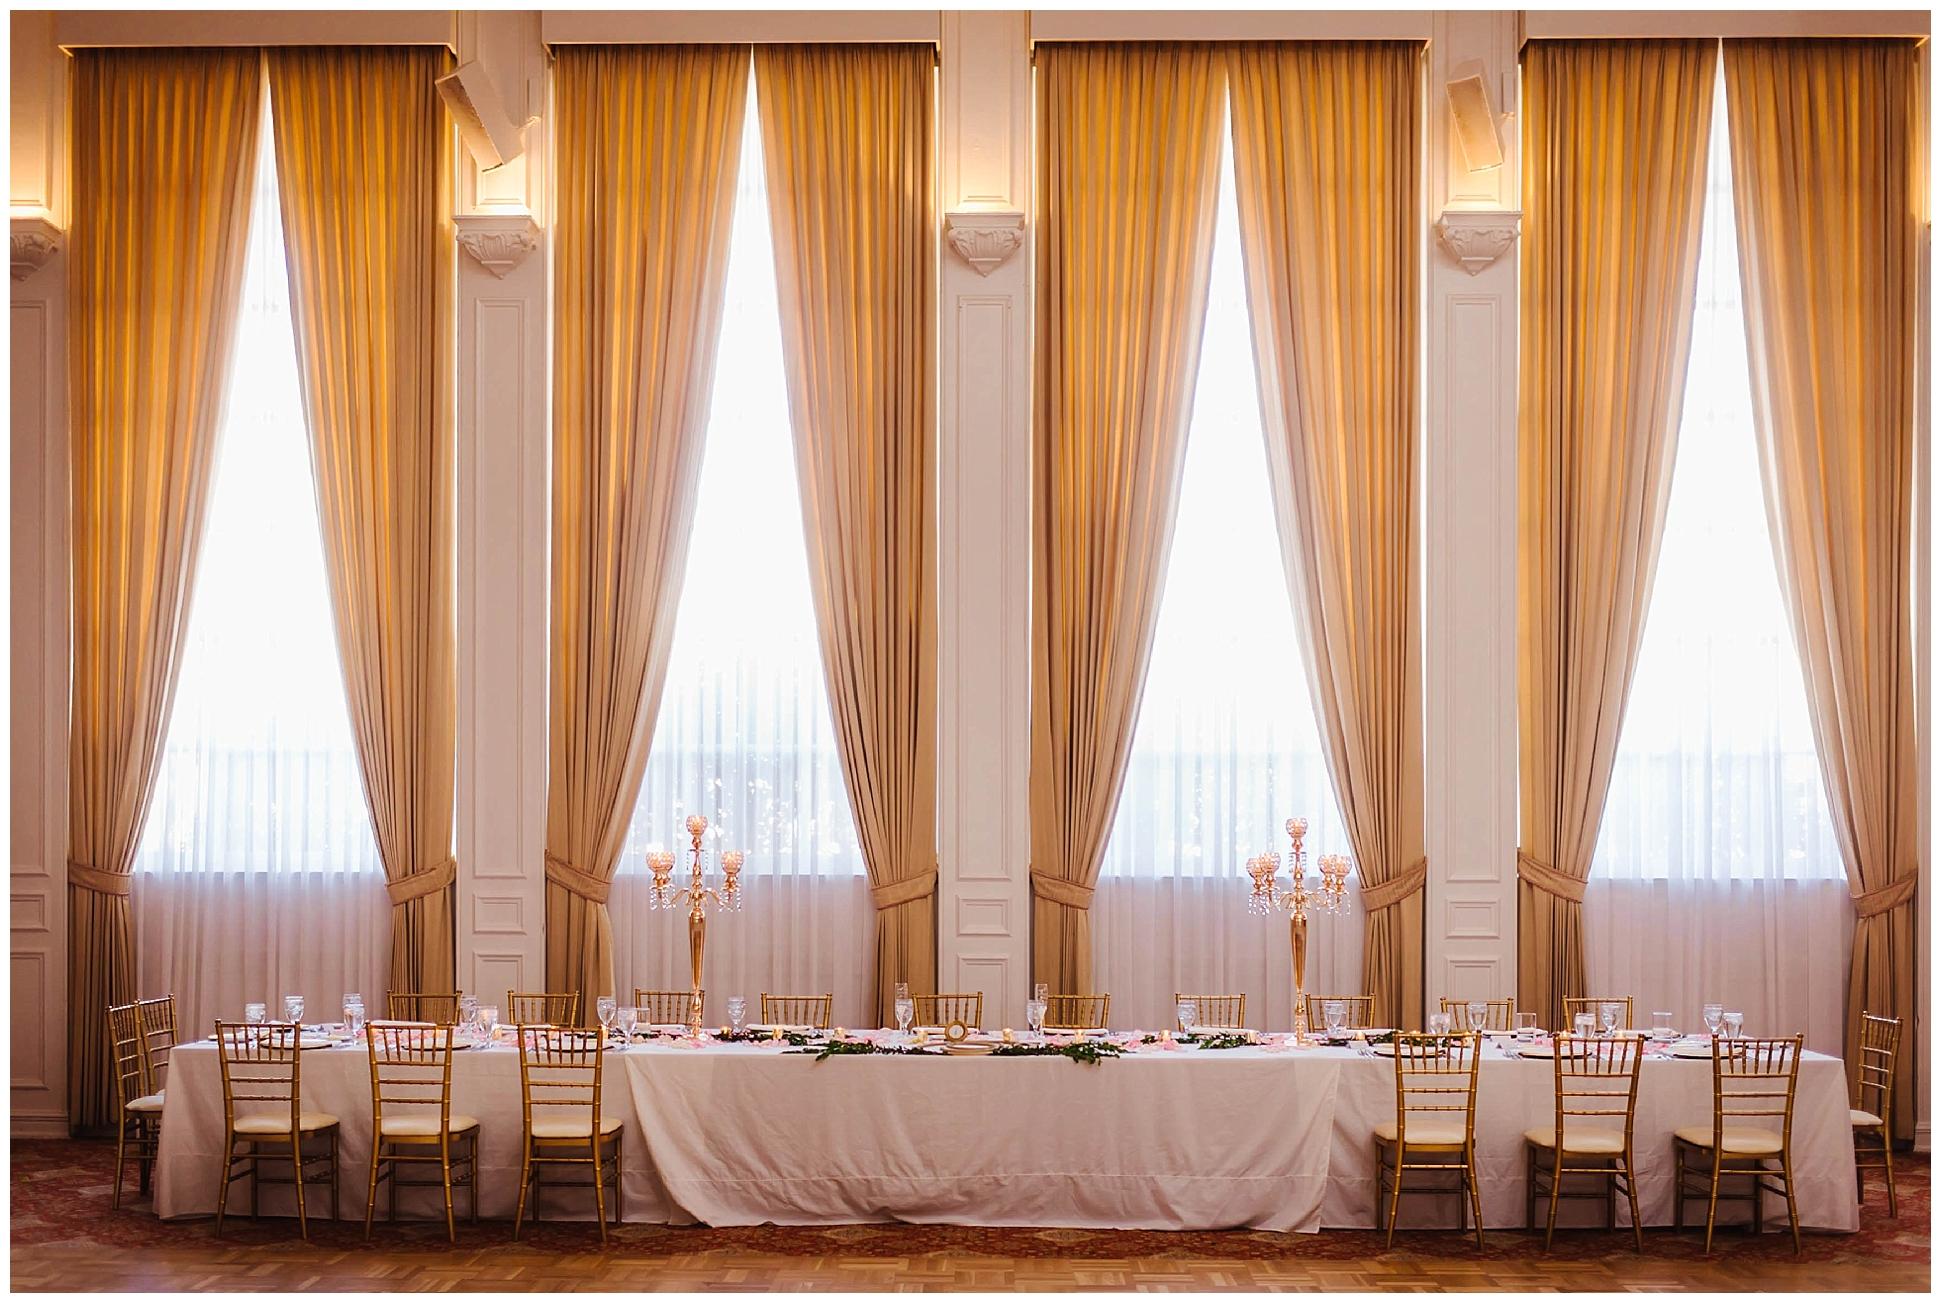 tampa-wedding-photographer-sleeves-palma-ceia-country-club-golf-course-sunset-luxury_0060.jpg